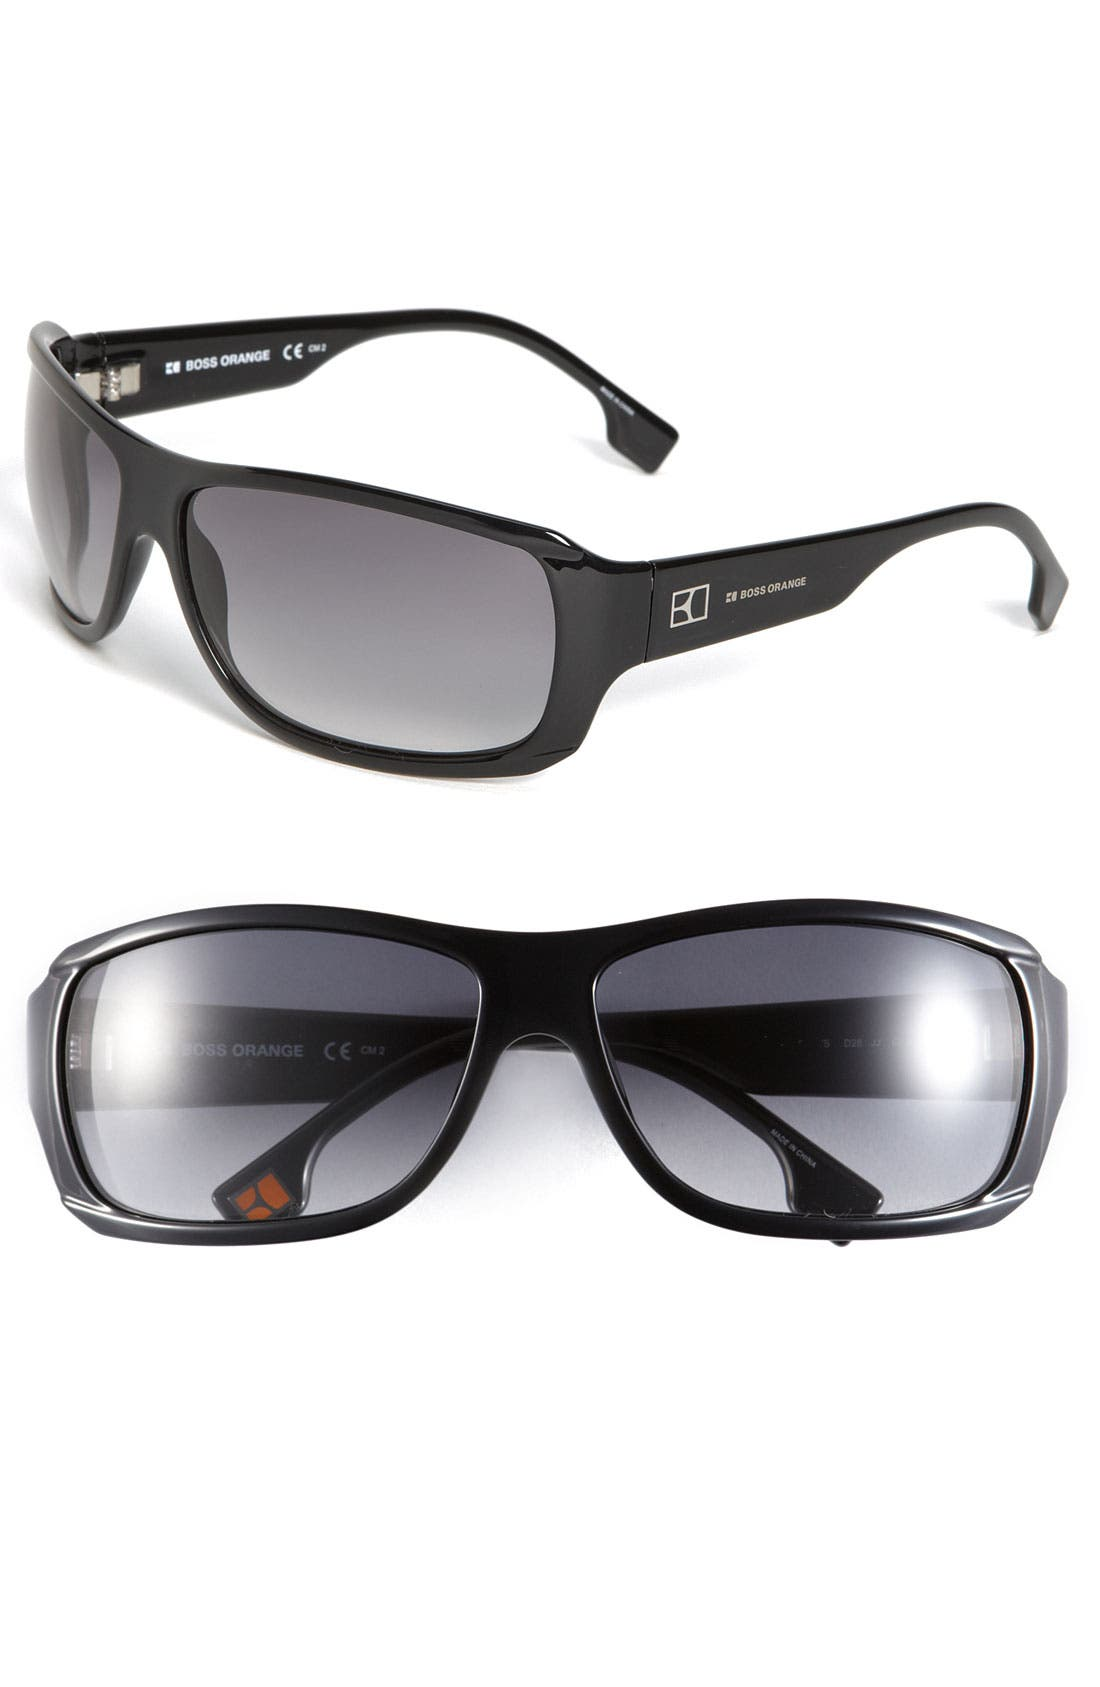 Main Image - BOSS Orange Rectangle Sunglasses